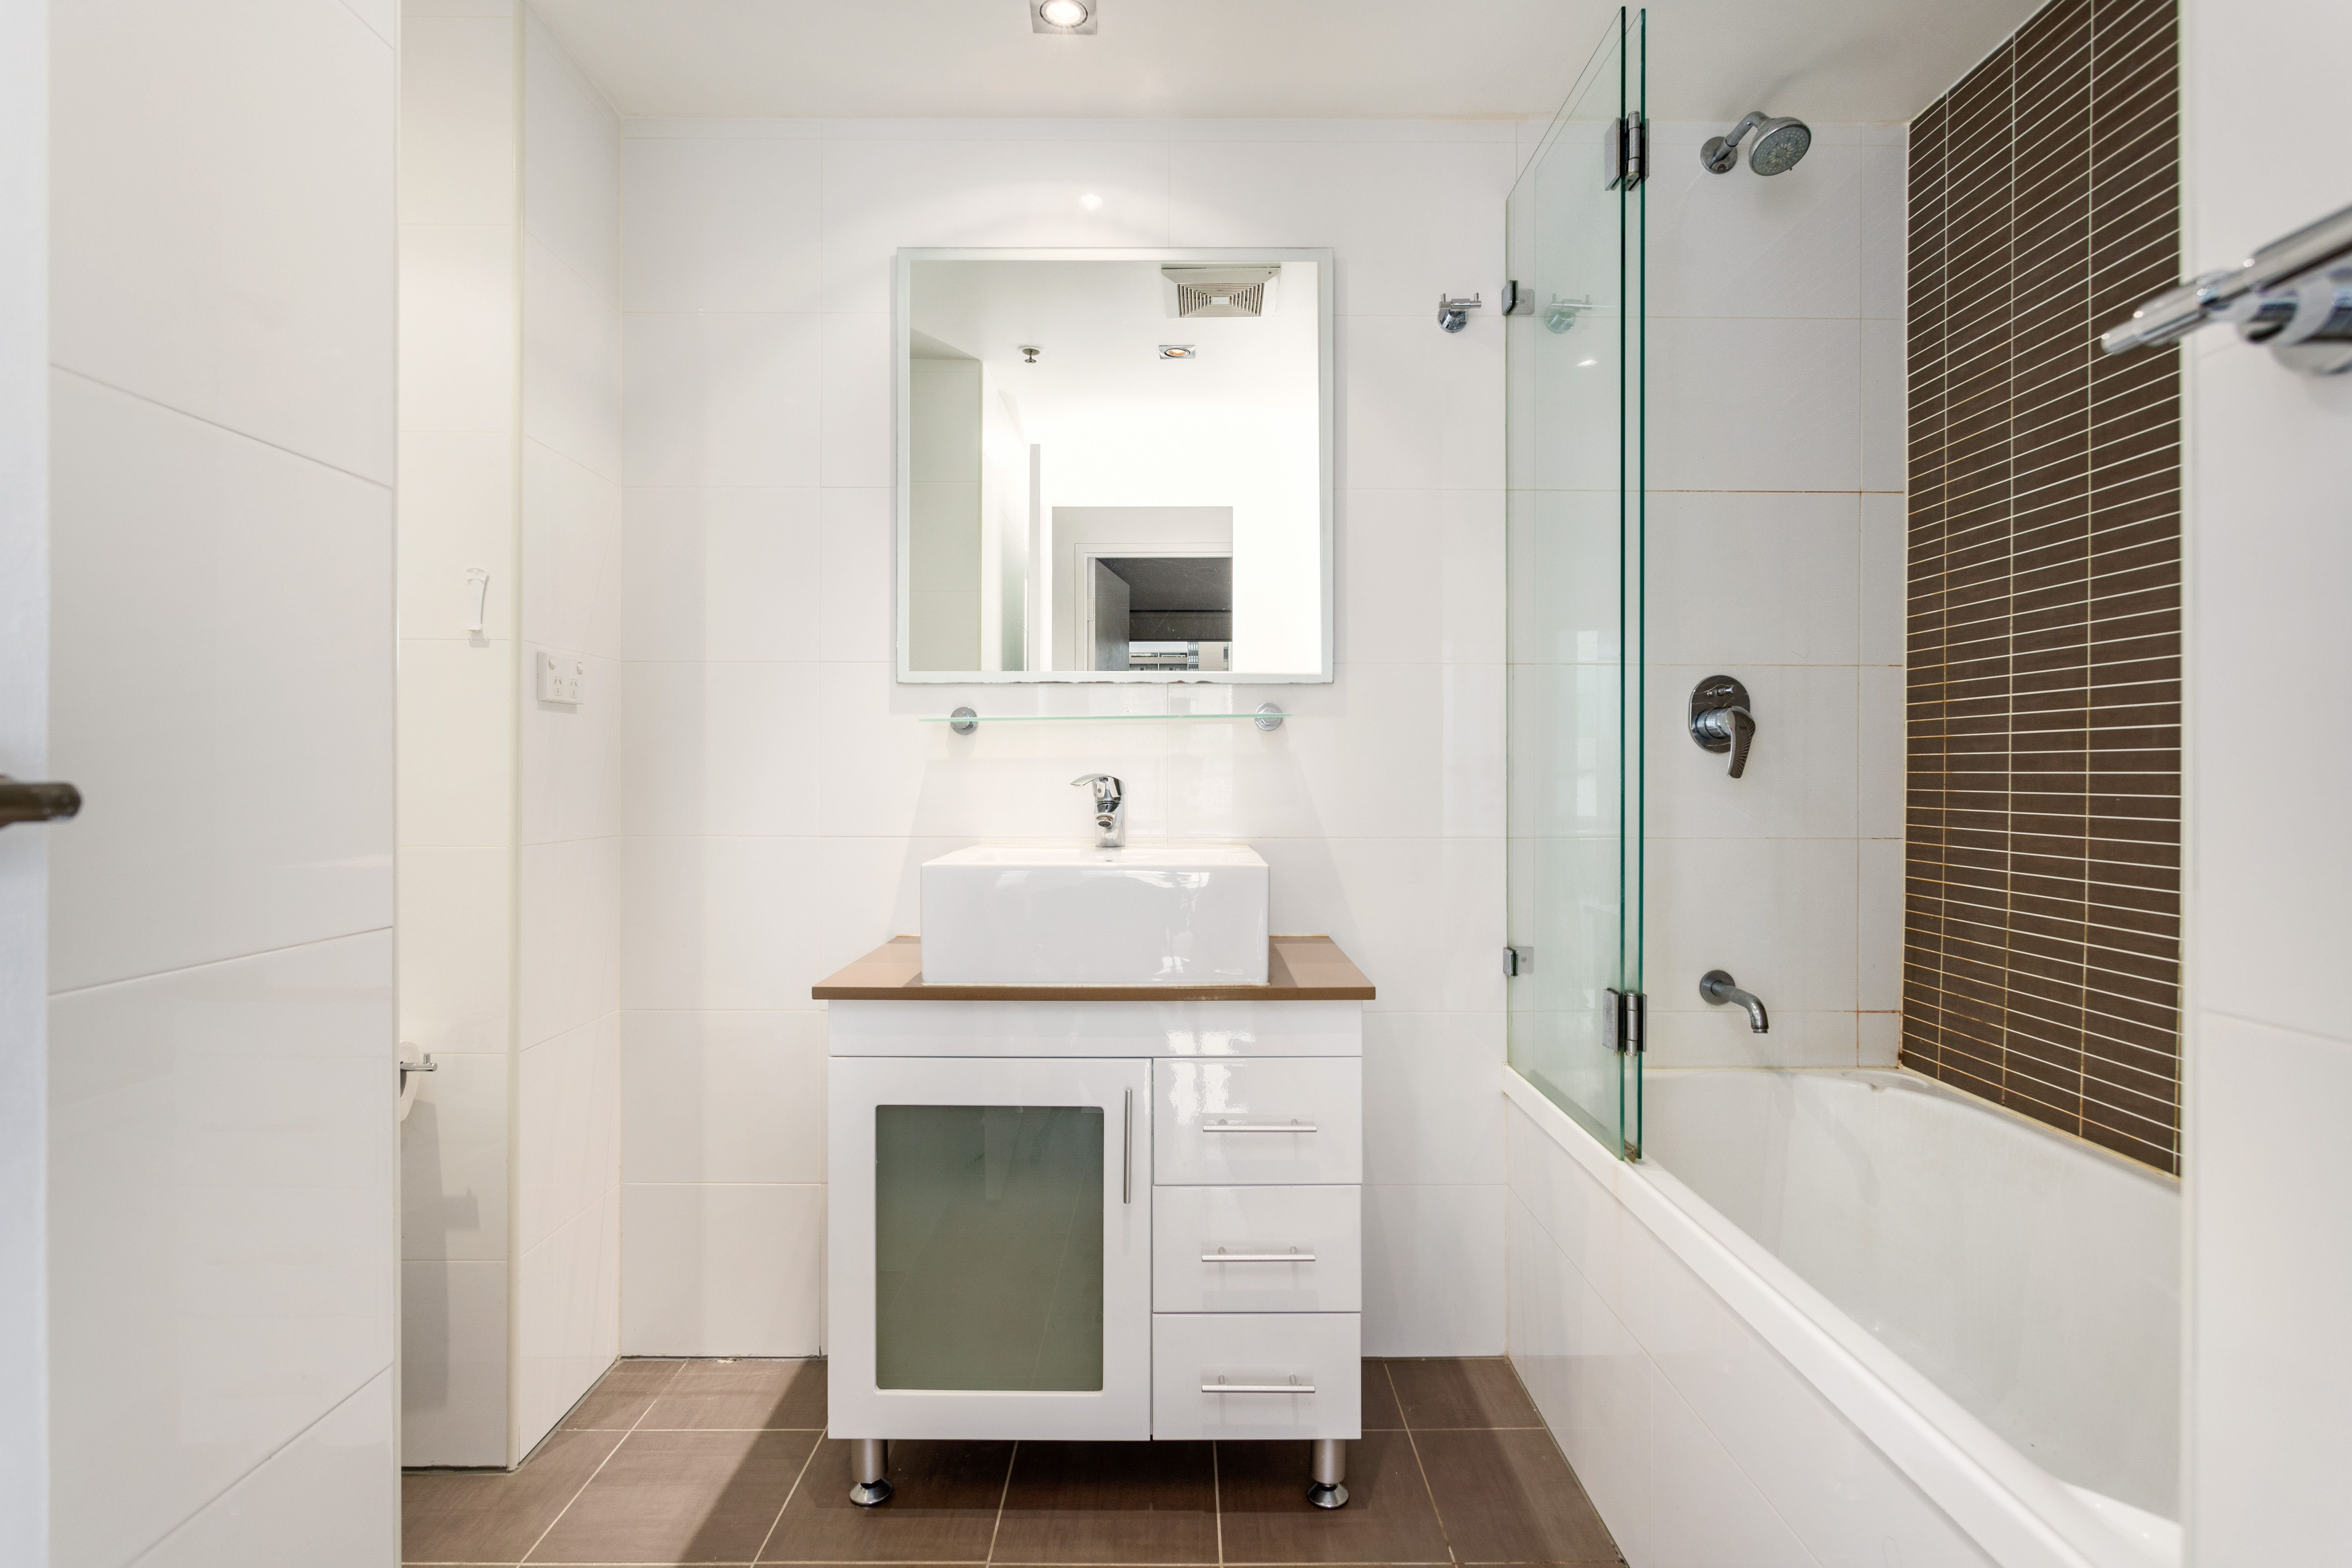 604c/1-17 Elsie Street, Burwood NSW 2134